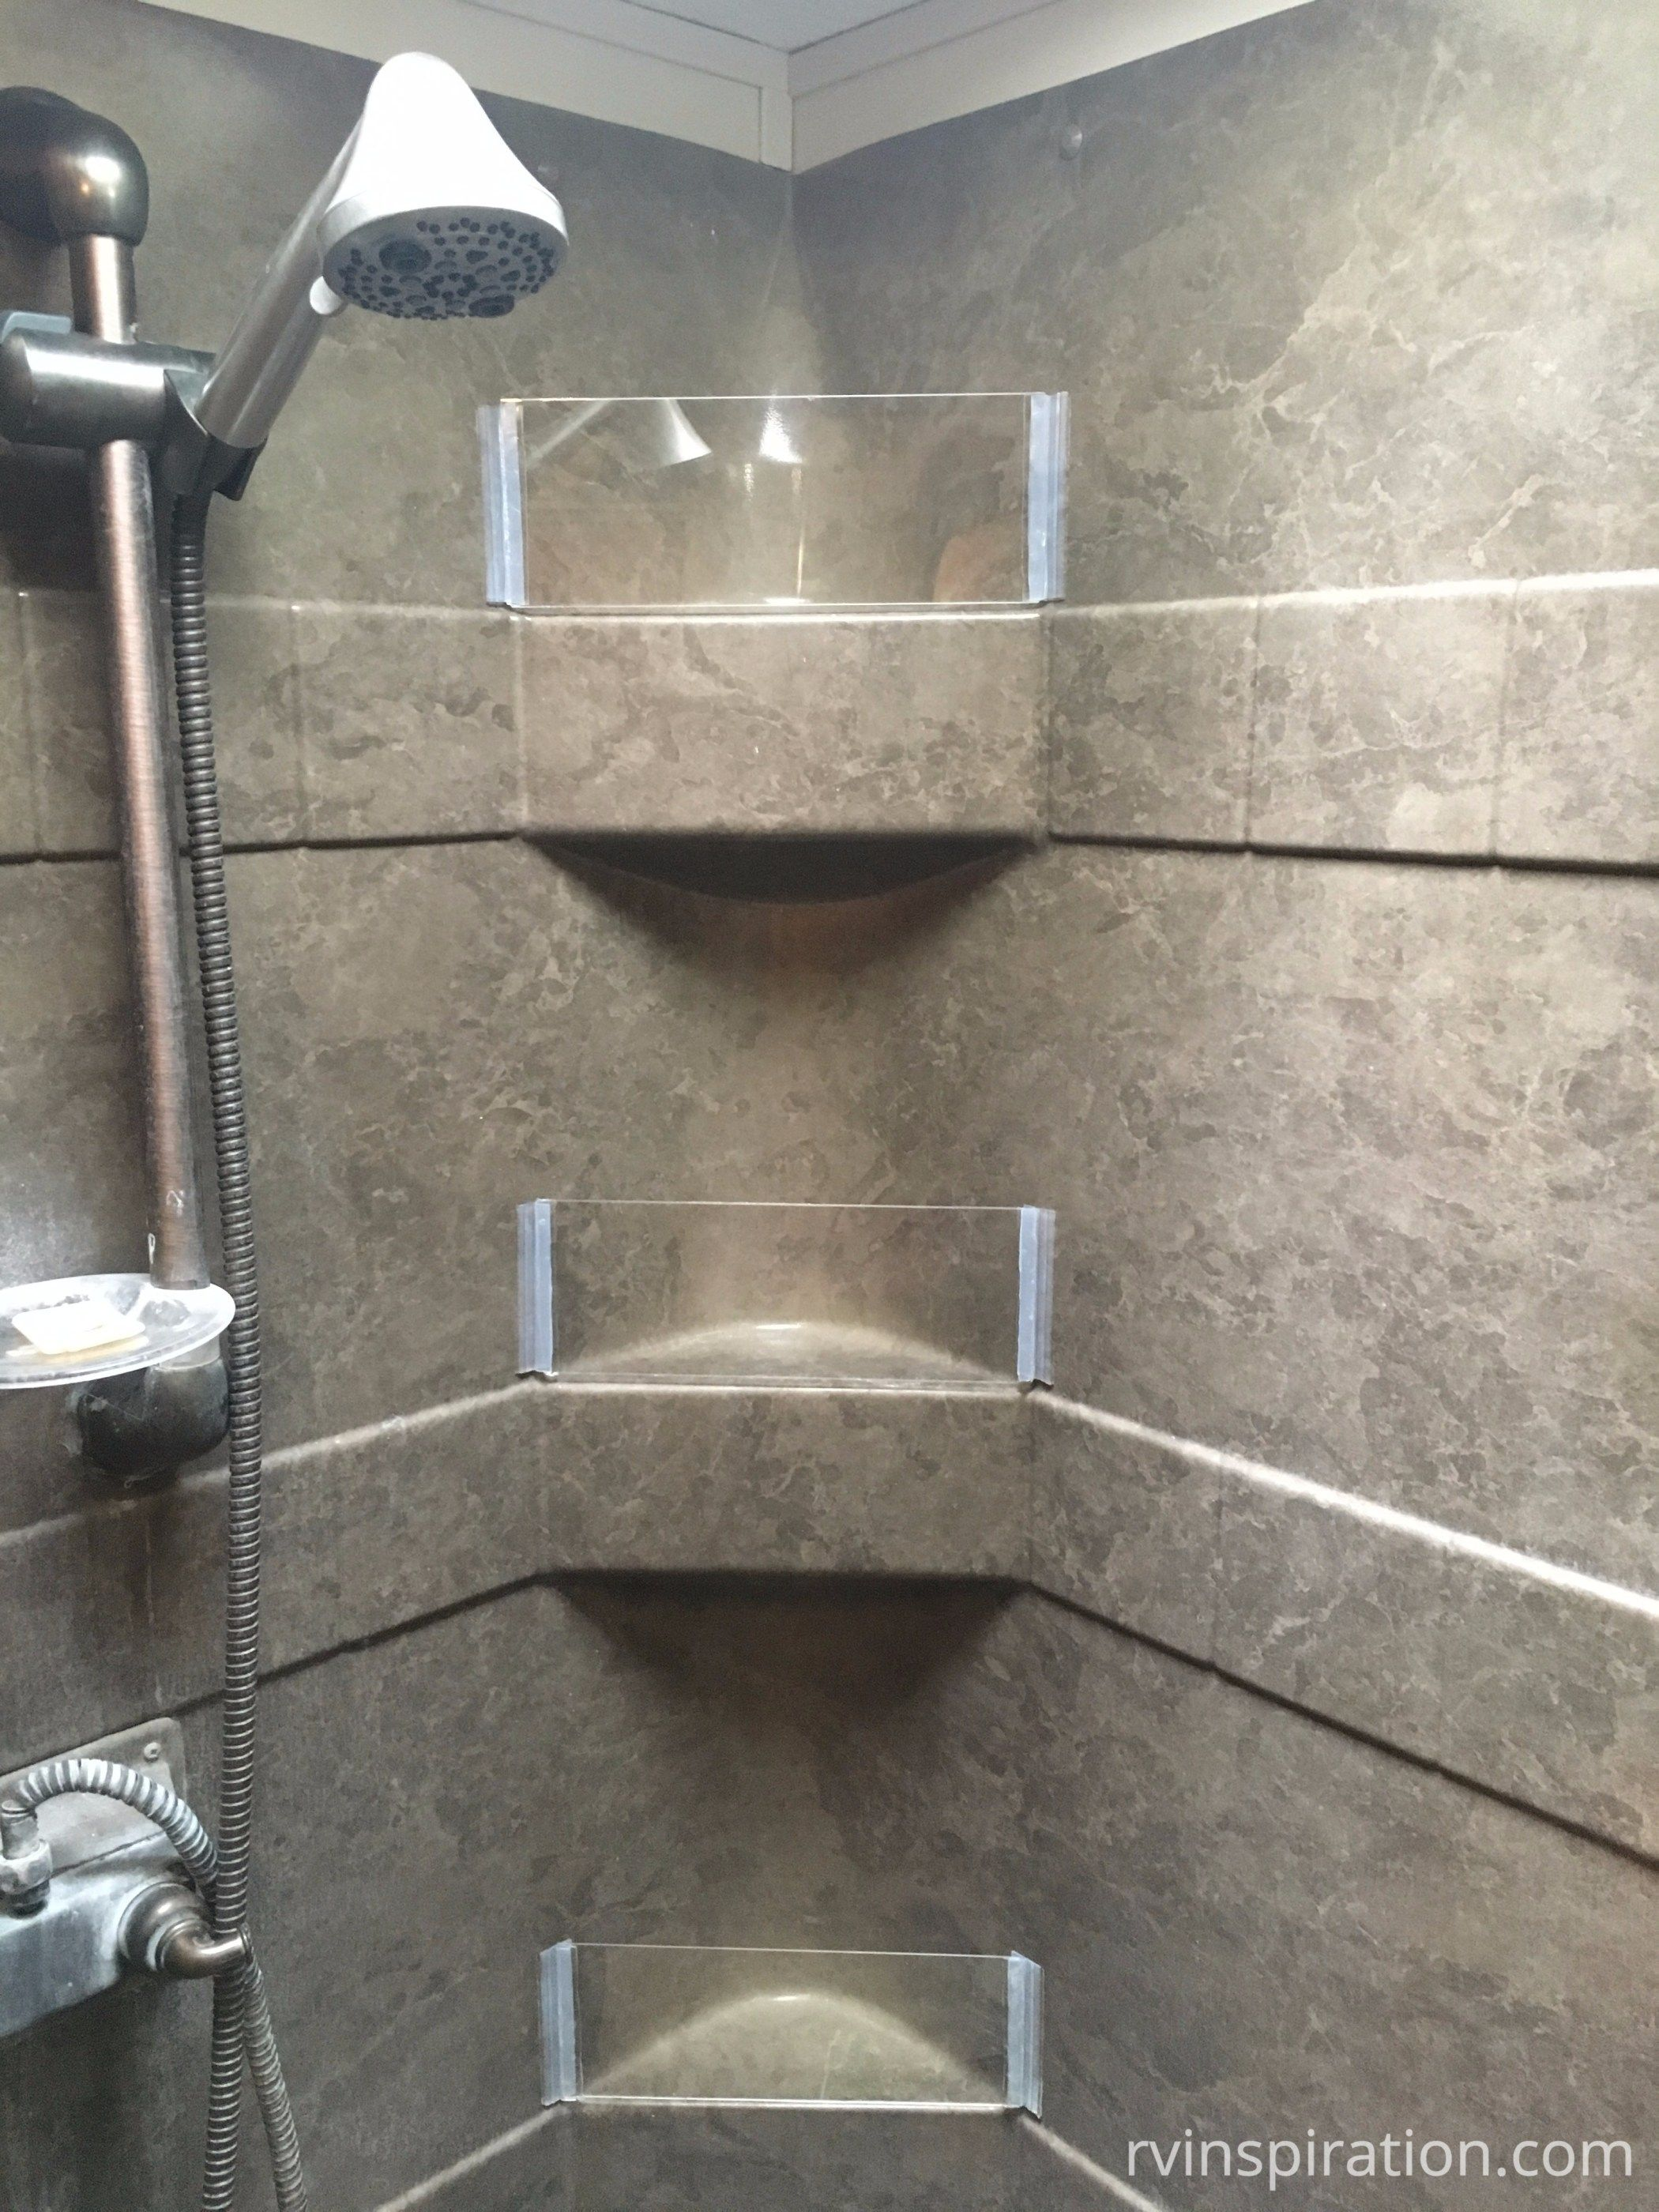 Diy How To Add Removable Walls To Shower Shelves Rv Inspiration Shower Shelves Camping Shower Rv Bathroom